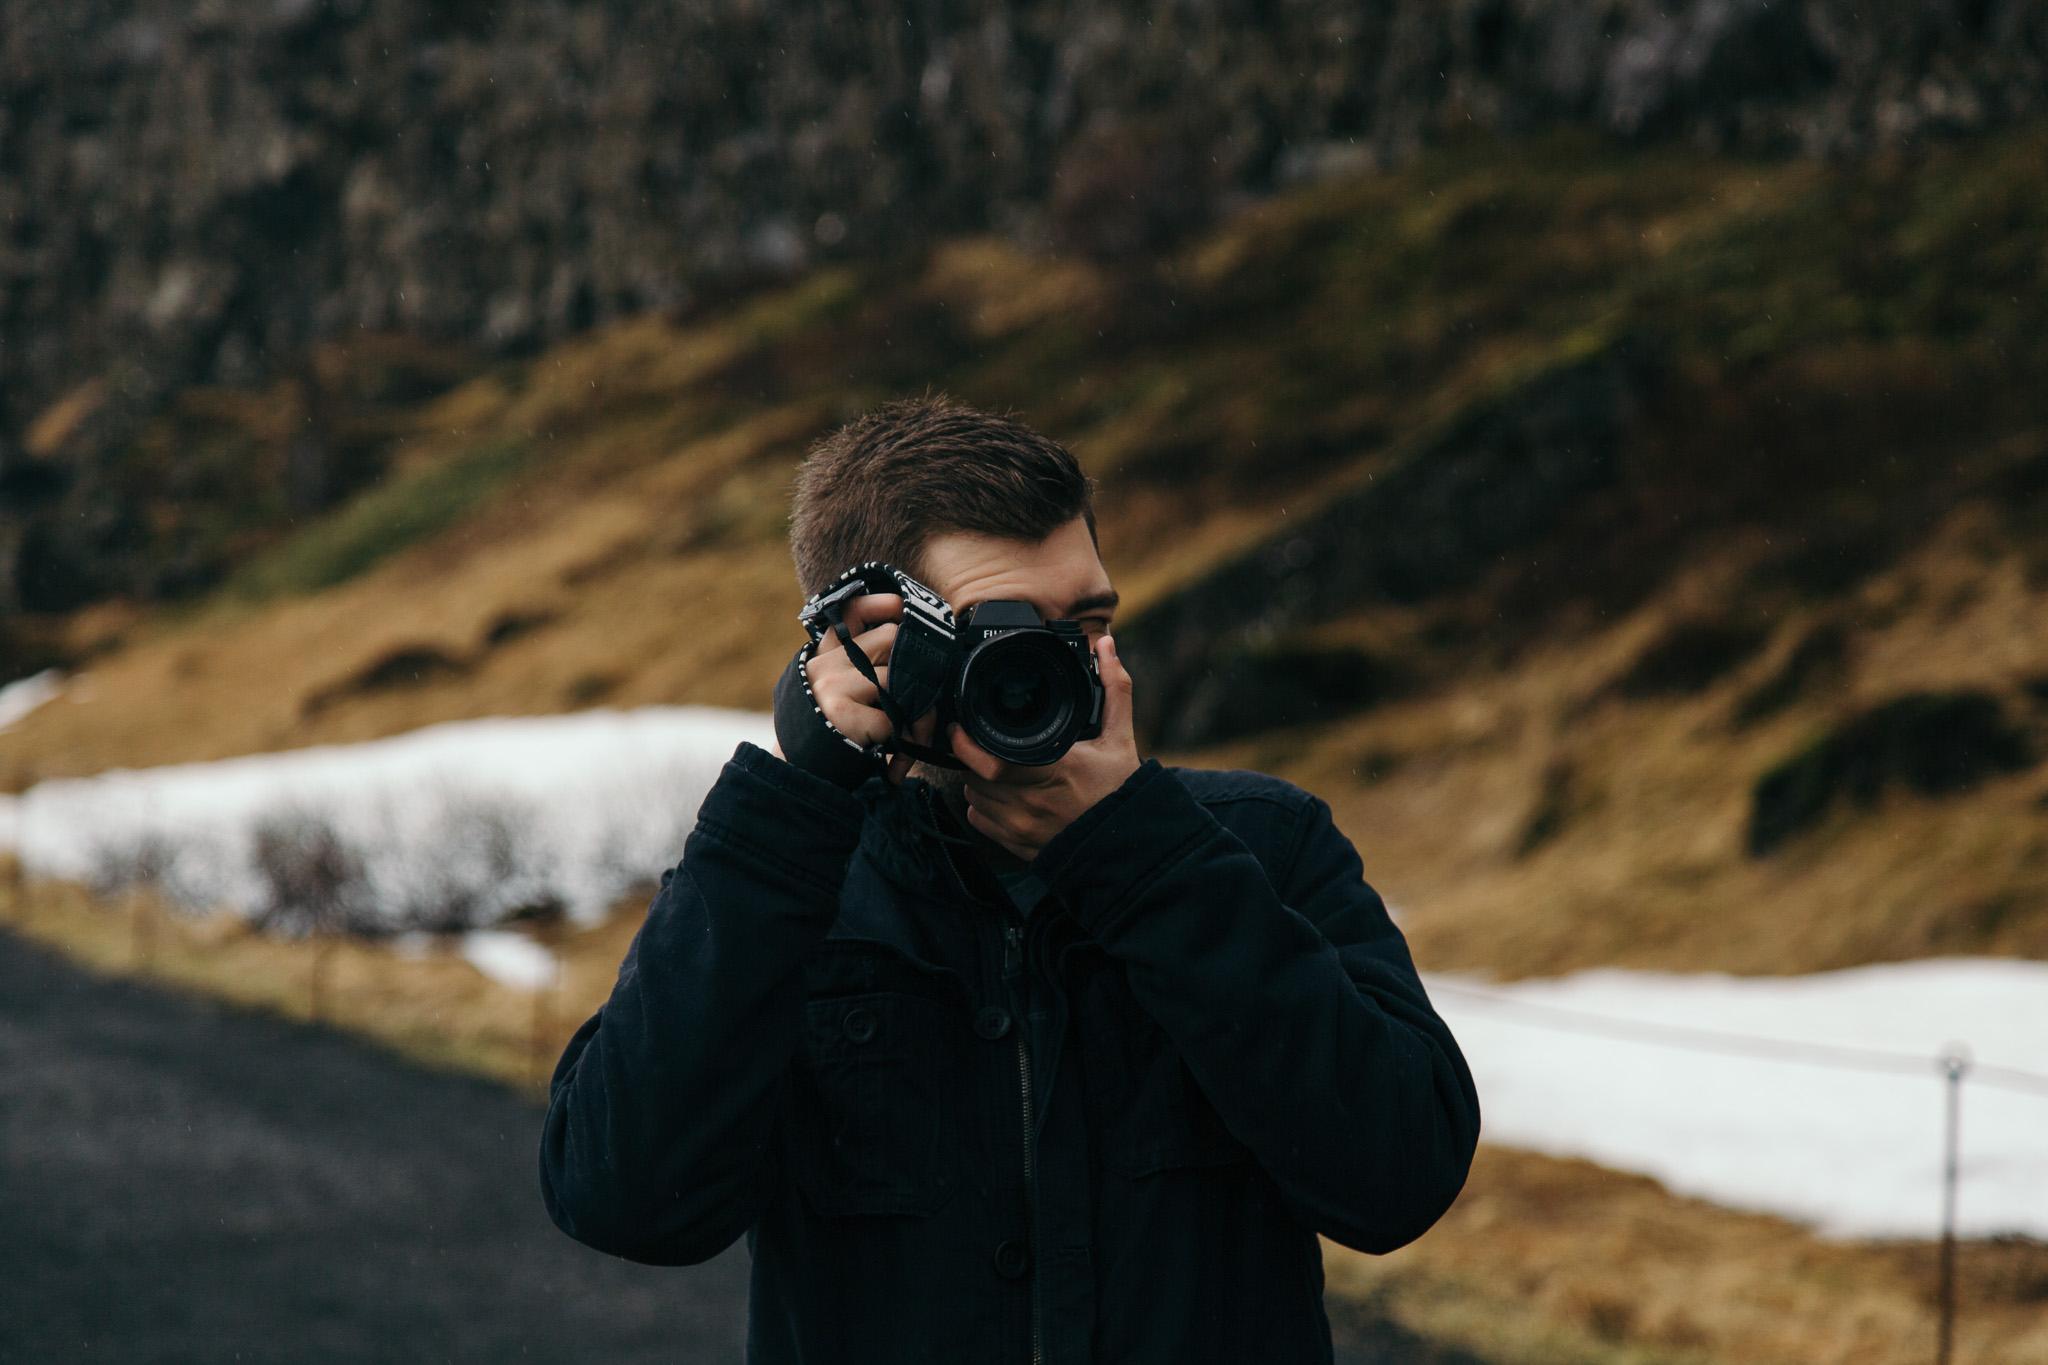 Copy of Iceland Trip Day 1 Jonathan Grado